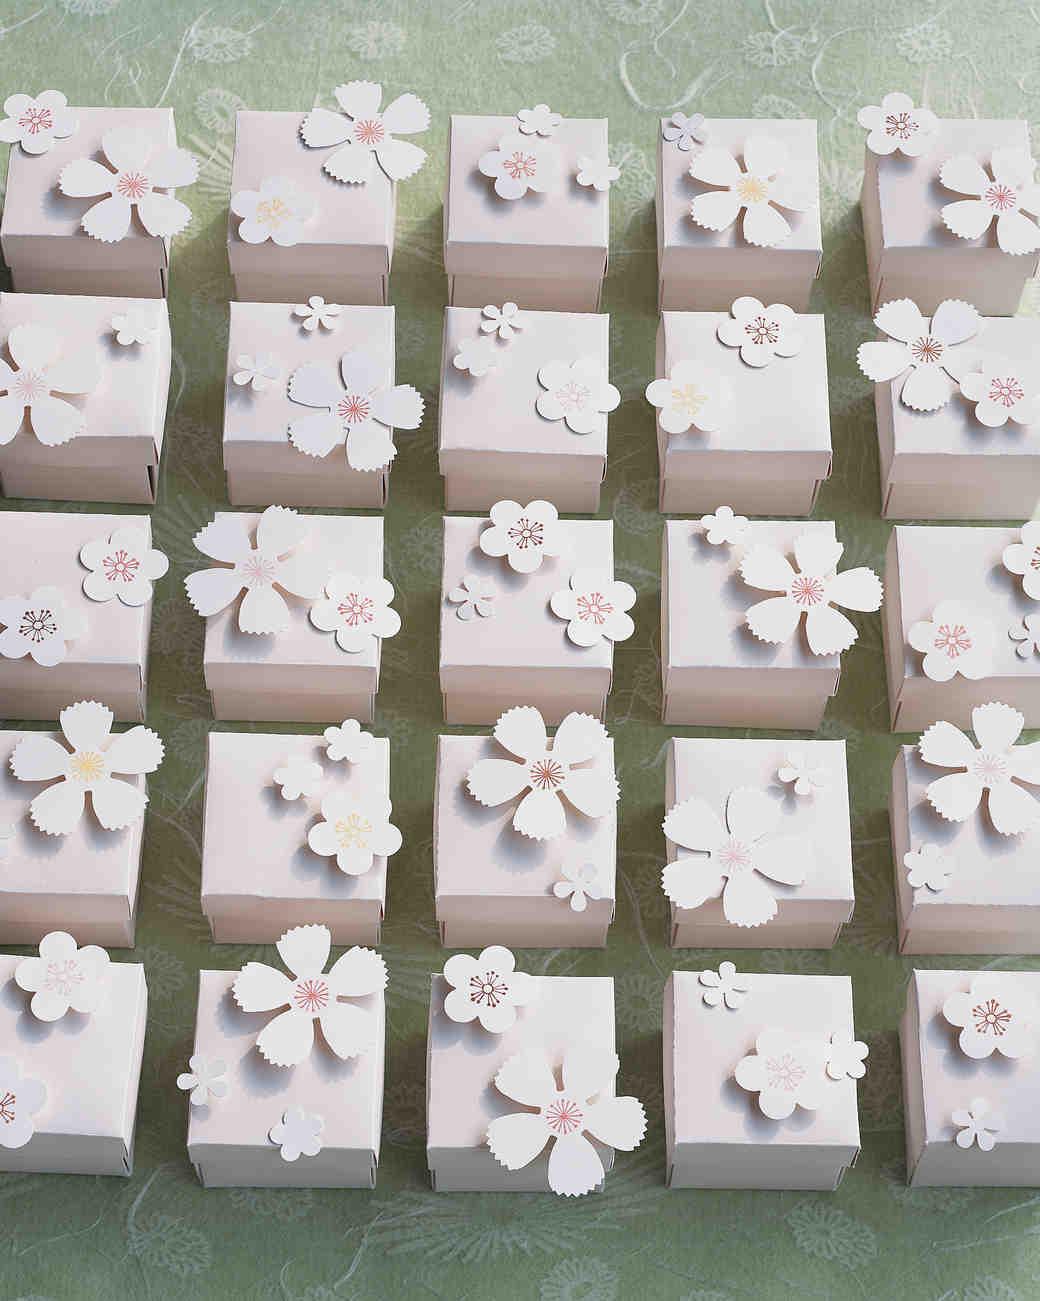 rustic wedding favor ideas round up diy wedding favors